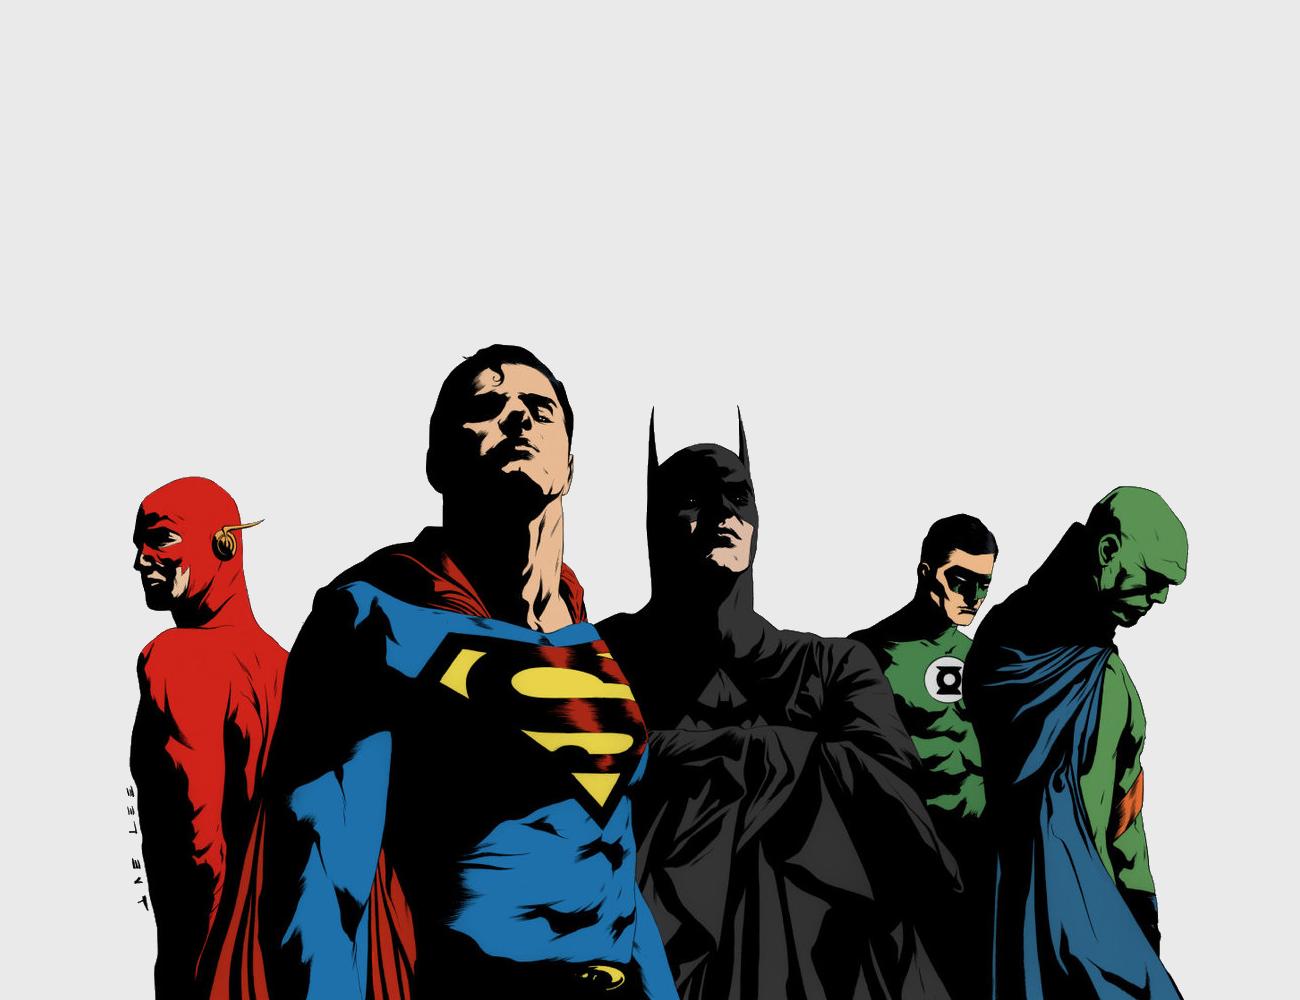 Wallpapers de superheroes   Taringa 1300x1000